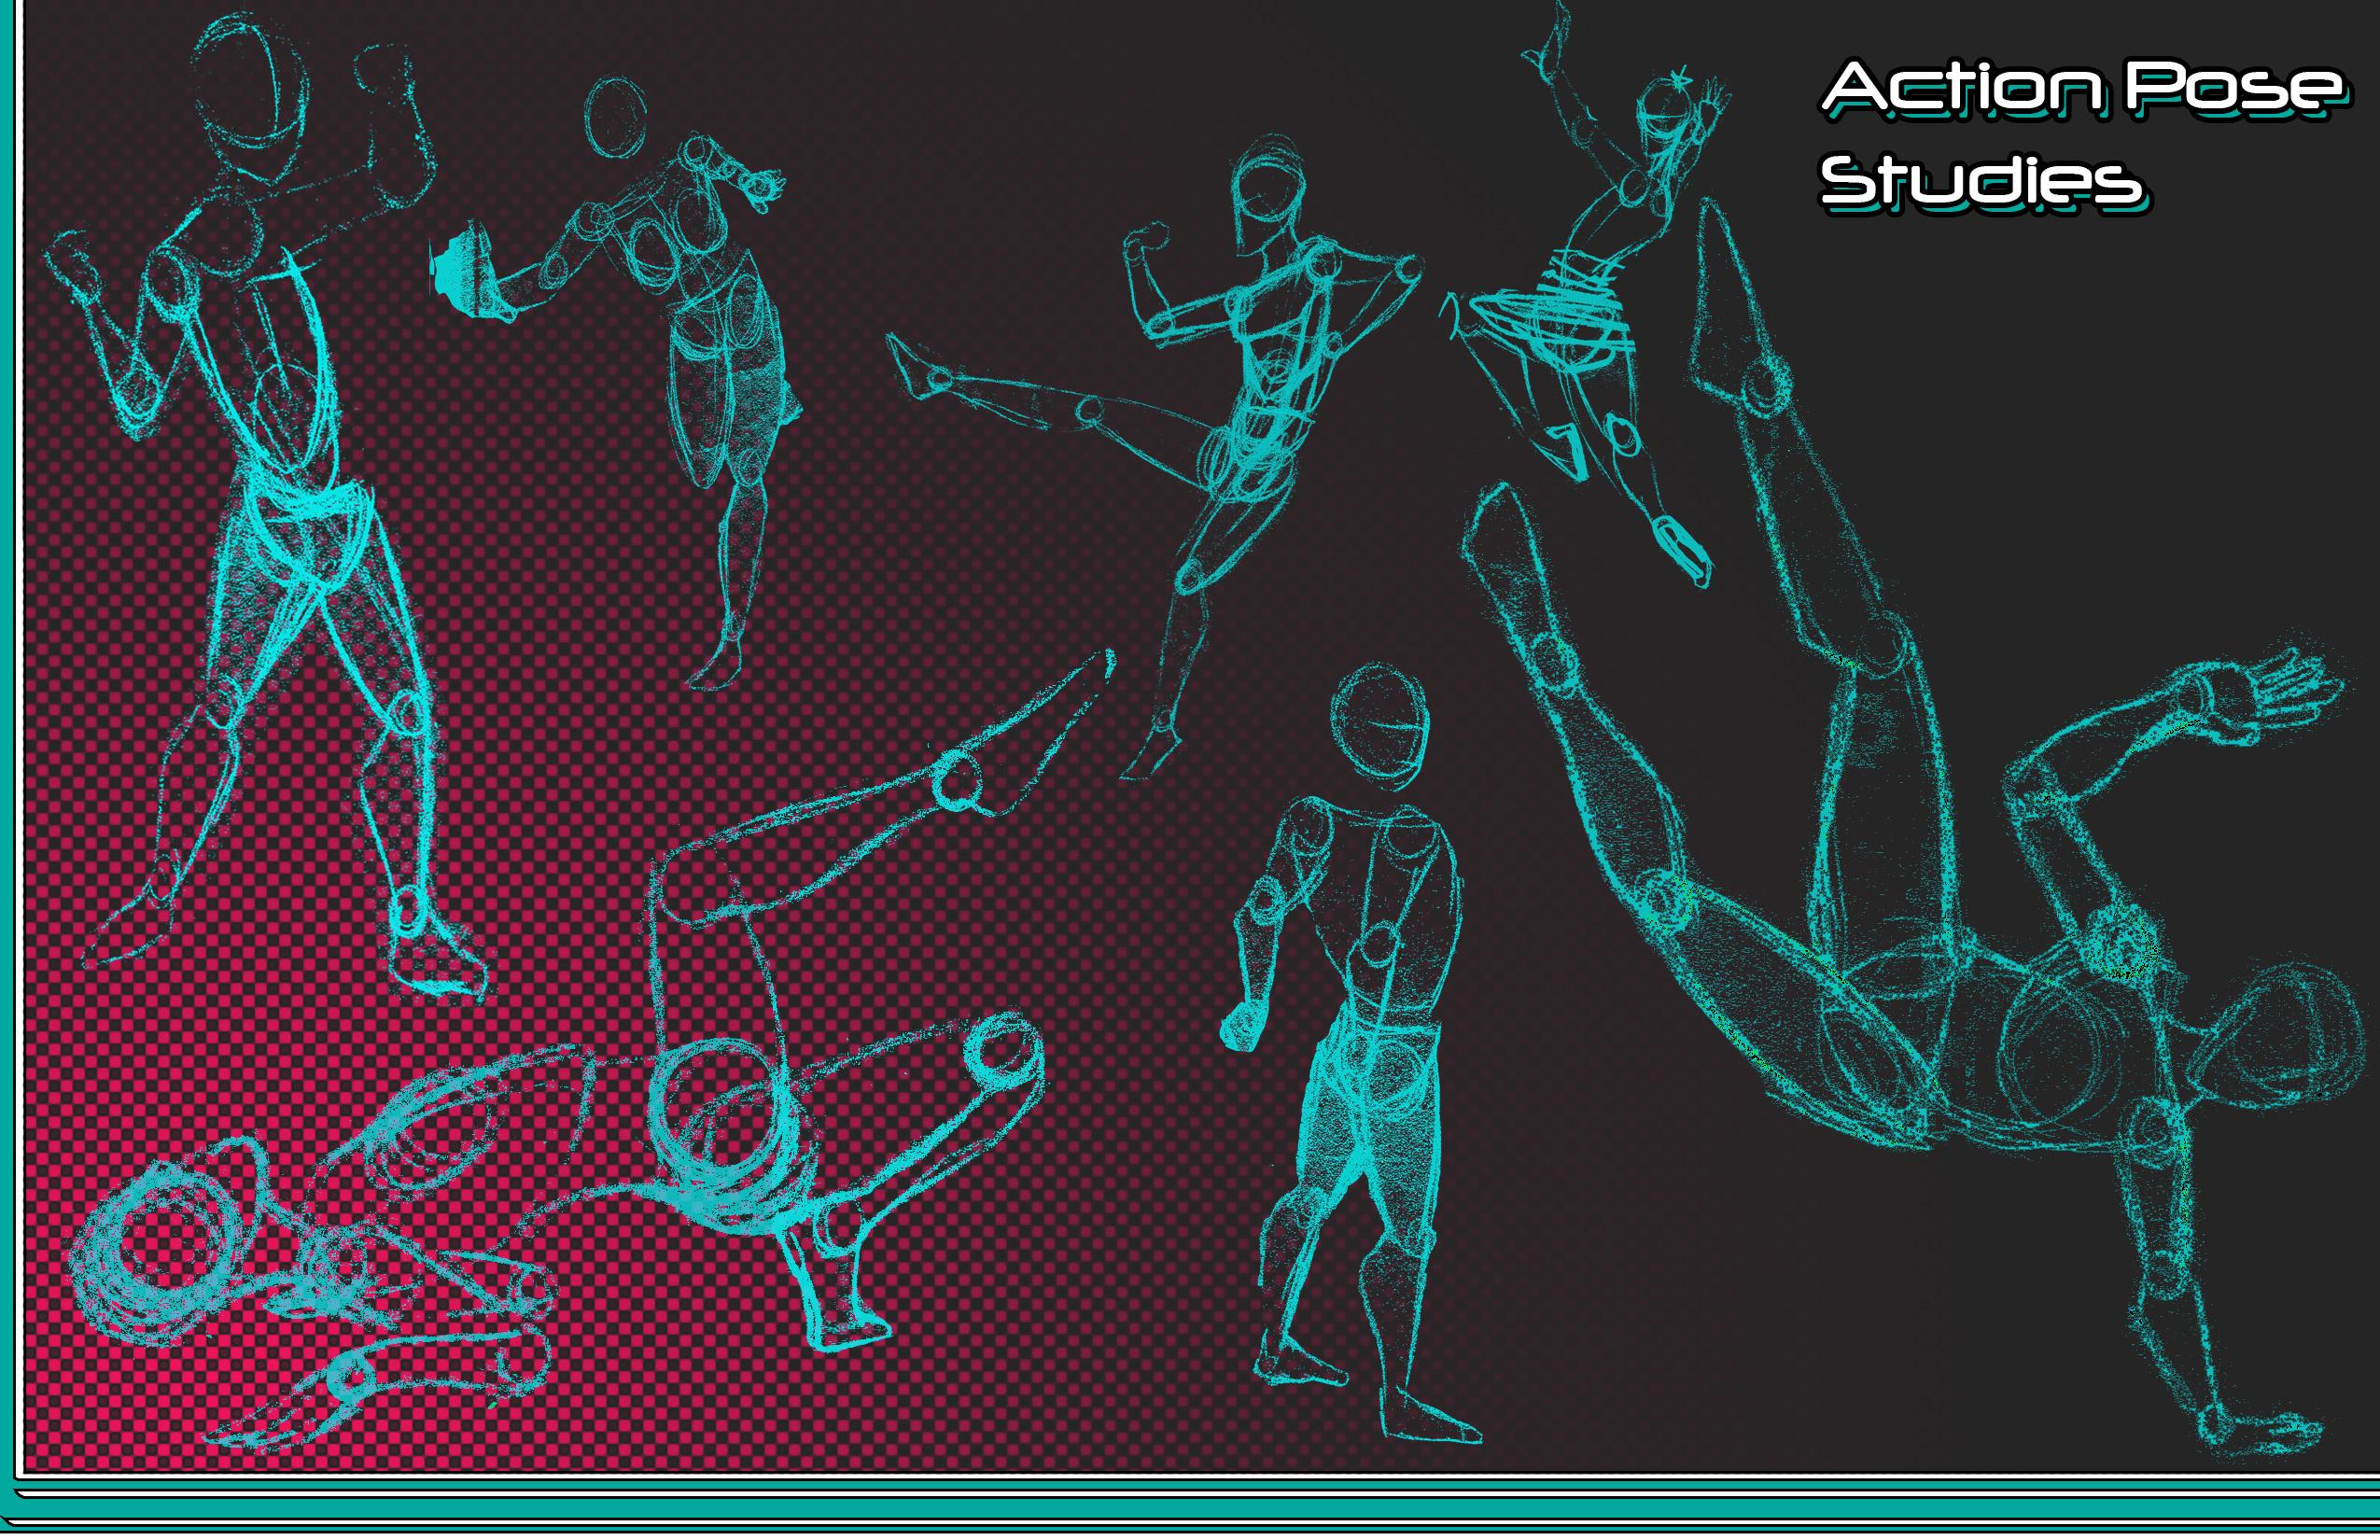 Action pose studies